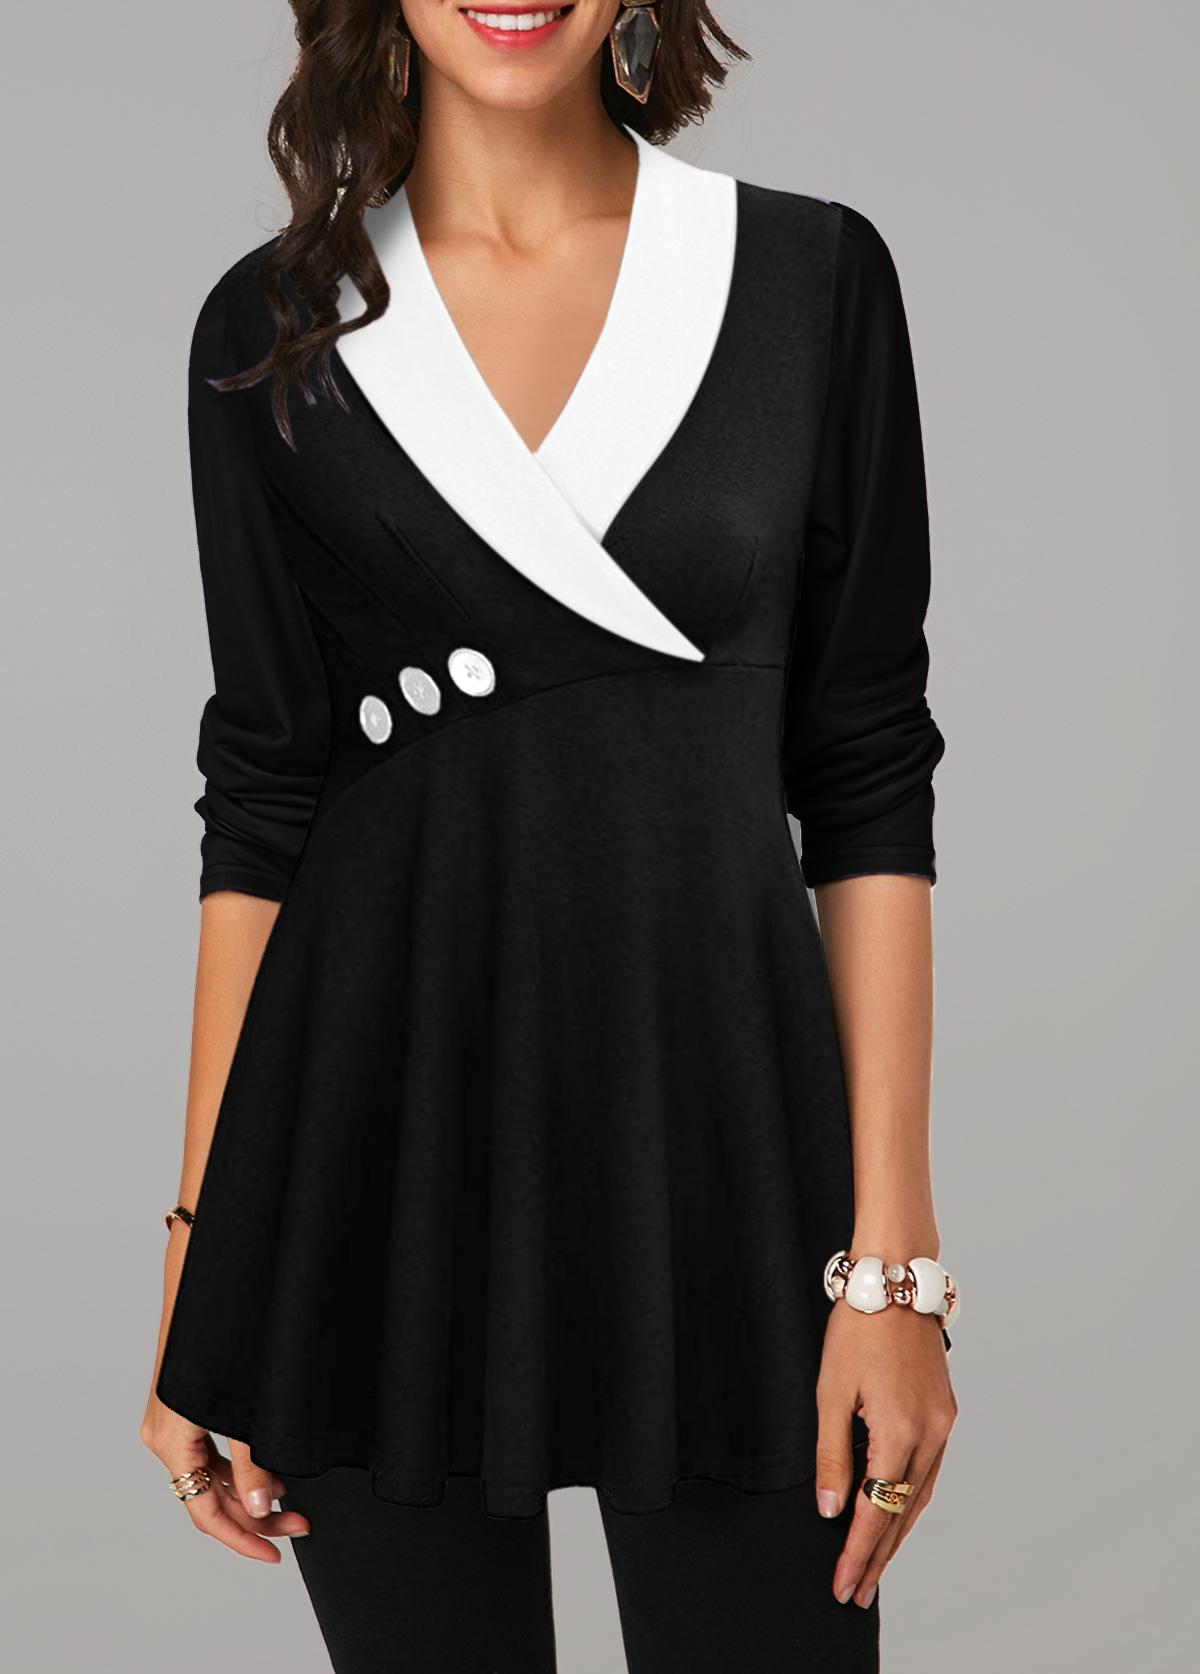 V Neck Button Detail Long Sleeve T Shirt